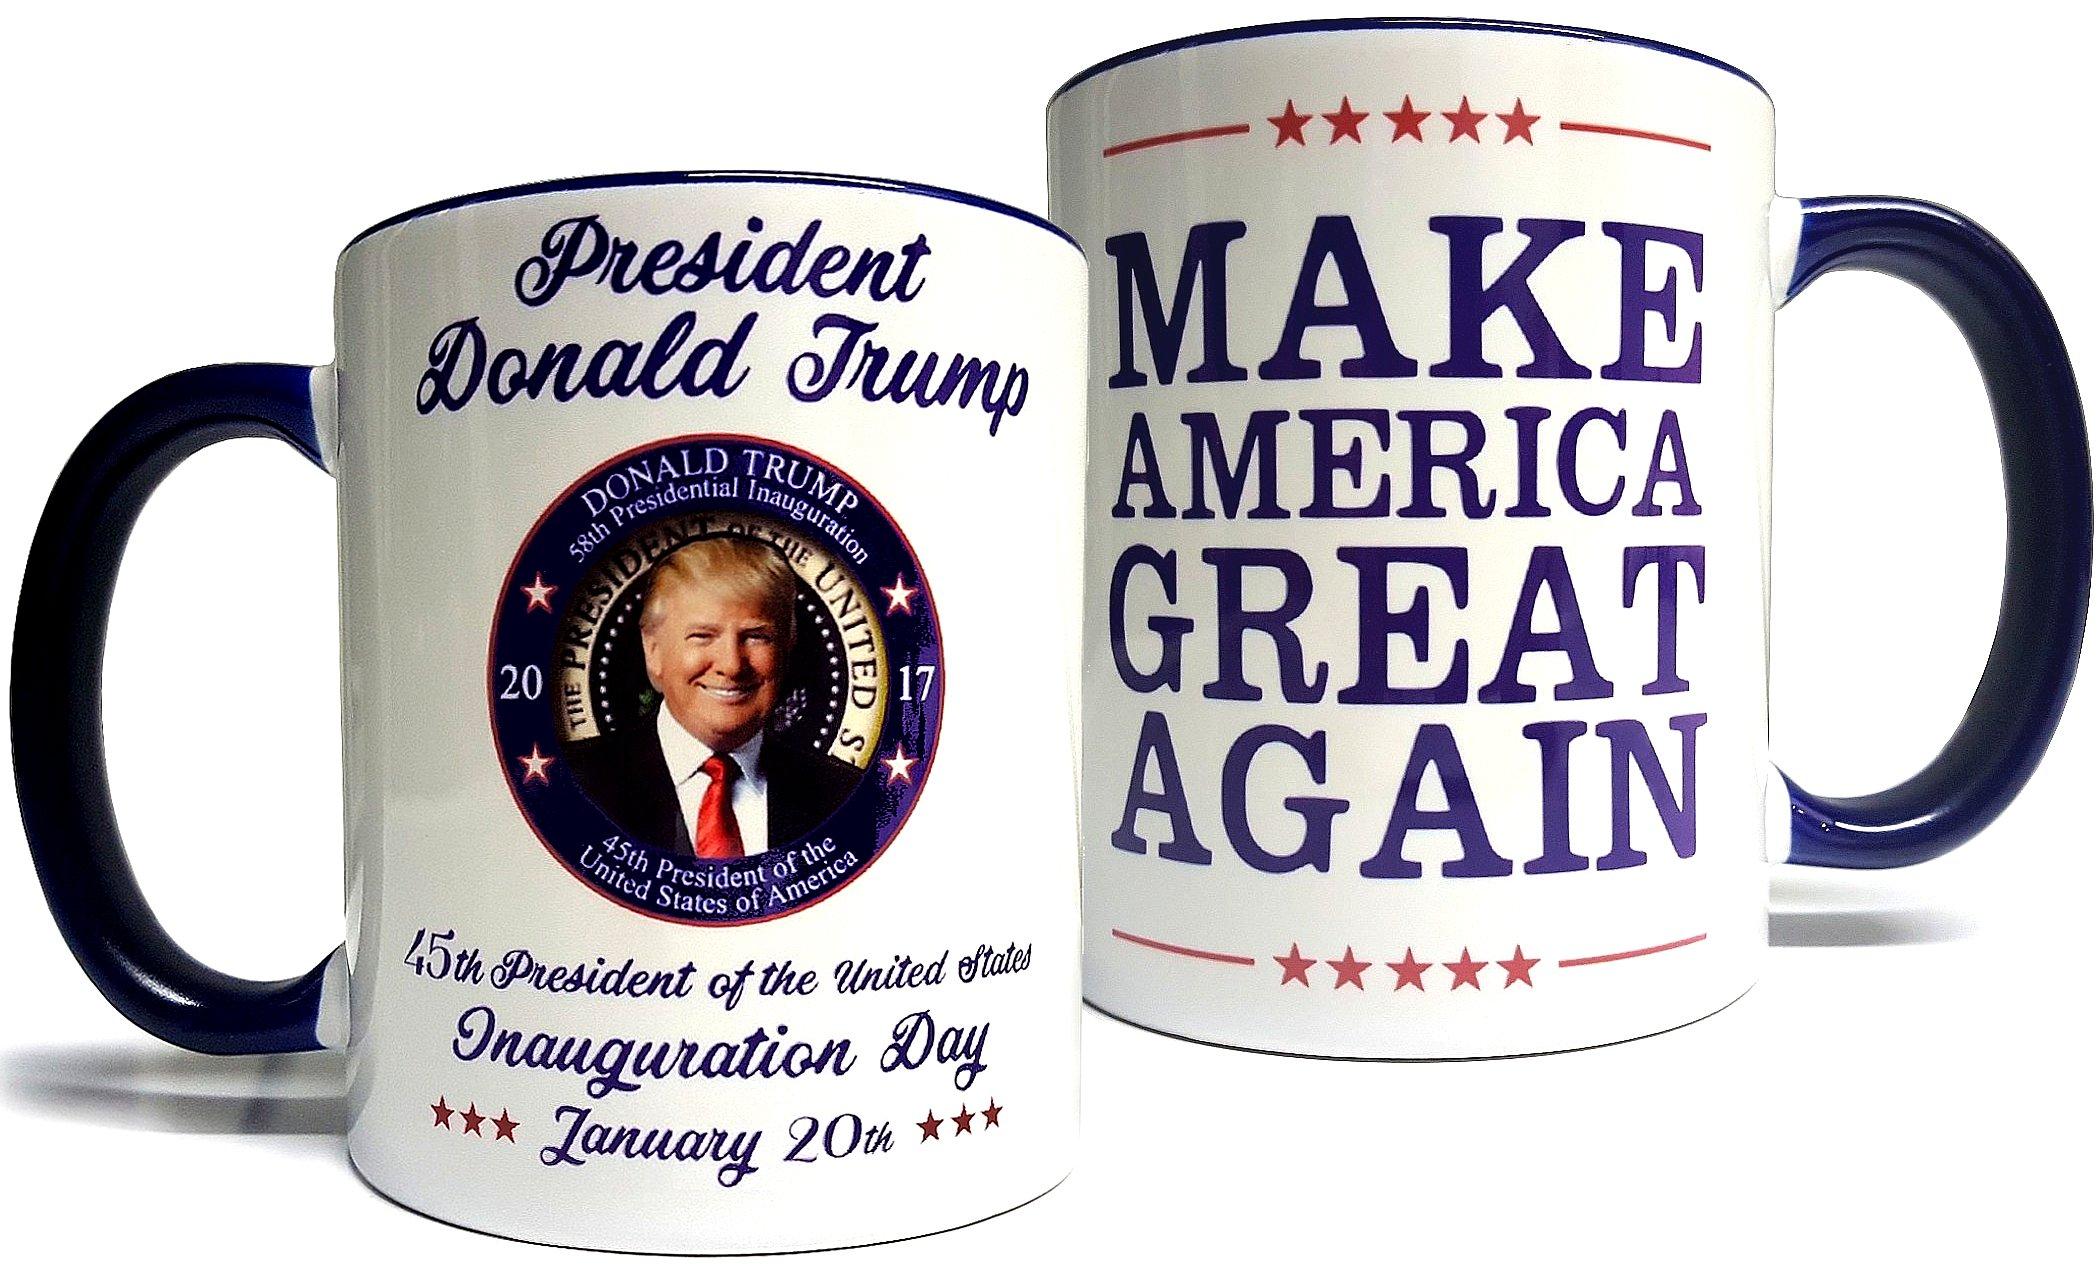 Donald Trump Inauguration Mug - Make America Great Again - Quality Grade A Ceramic 11oz Mug/Cup - Foam Box Protection (Perfect Gift) by USA Prime